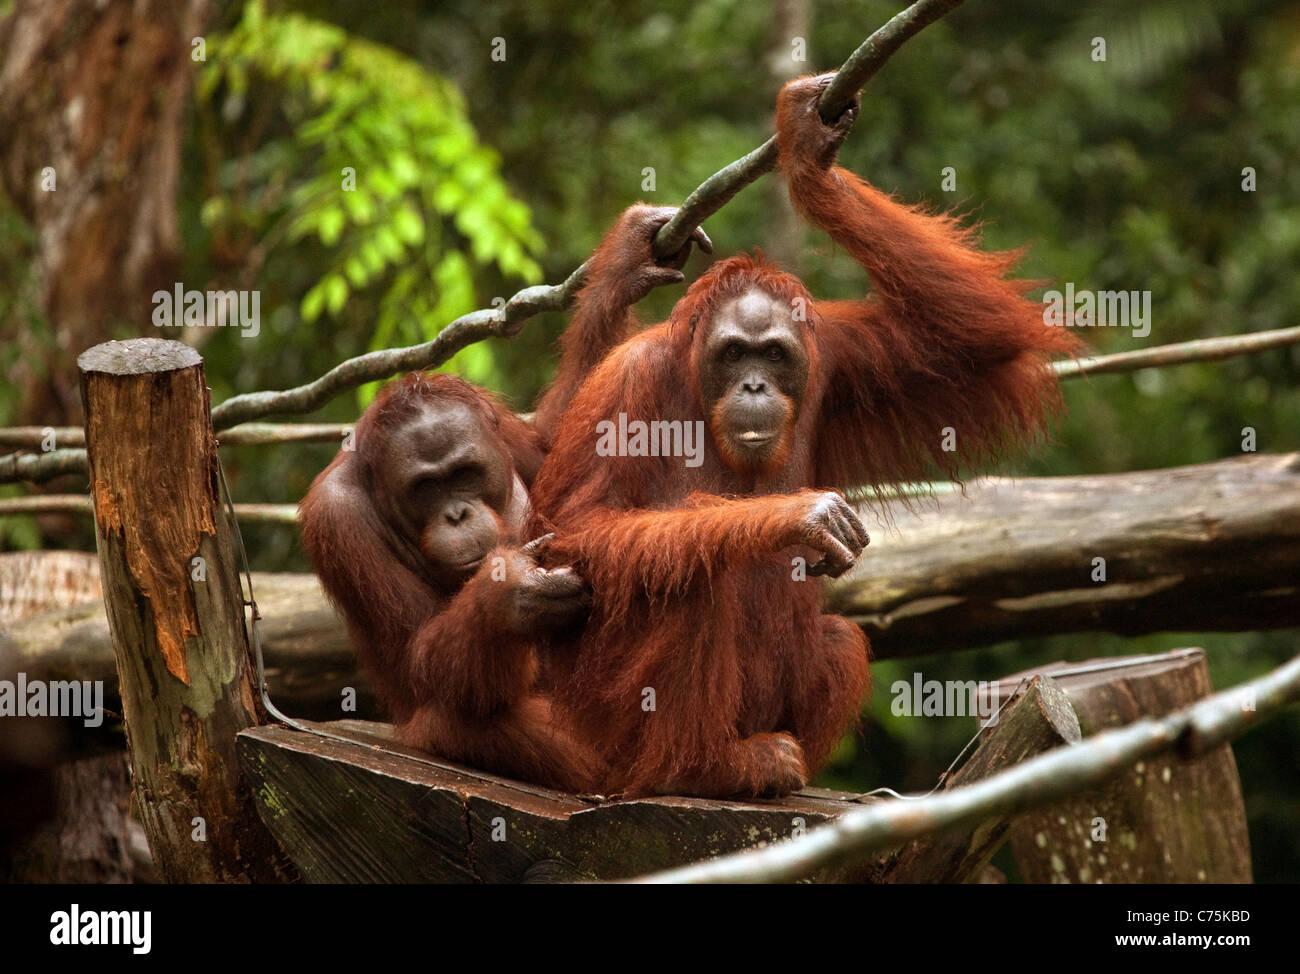 Due adulti Bornean orangutan (Pongo pygmaeus) presso lo zoo di Singapore, Singapore asia Immagini Stock